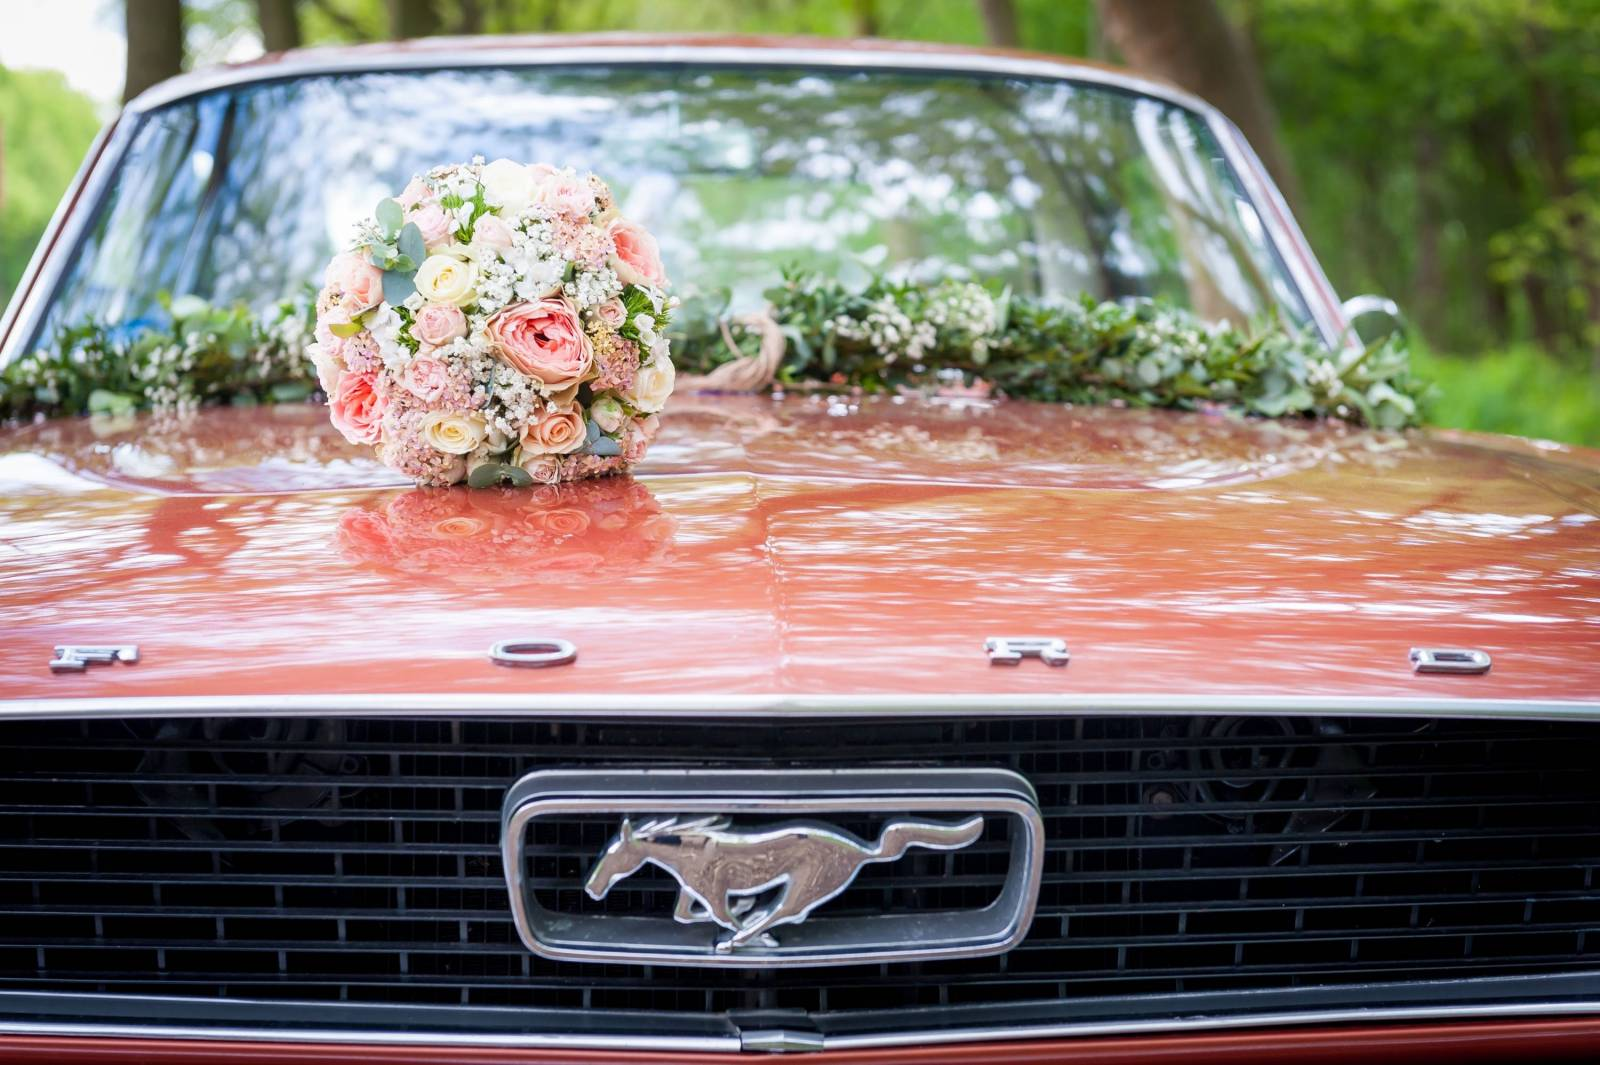 Carpe Diem Bloemen & Decoratie - House of Weddings  - 12